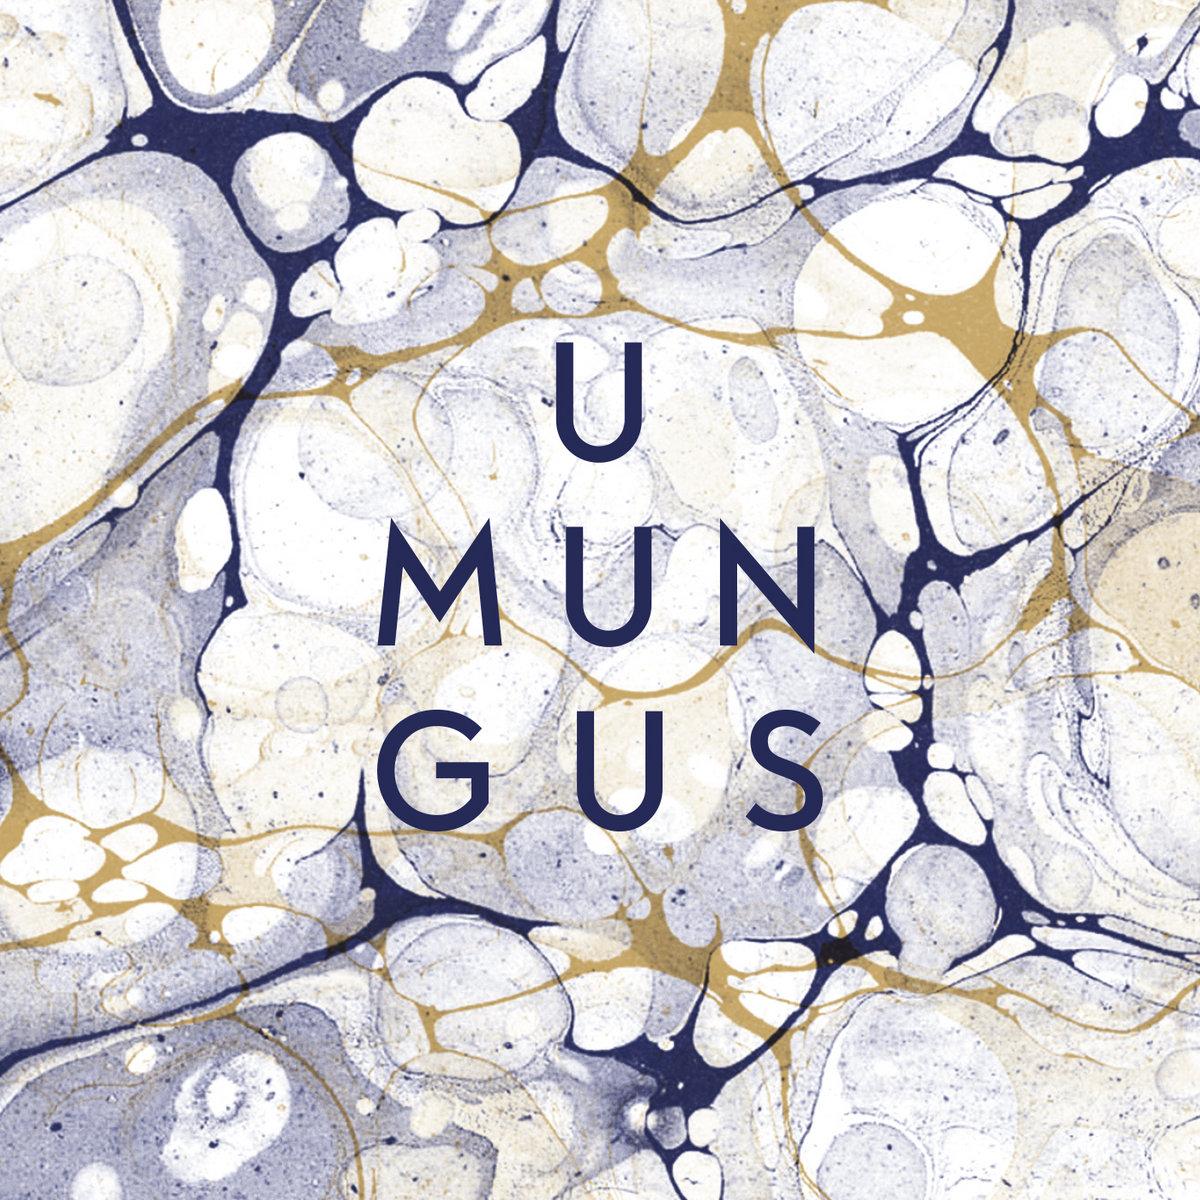 Umungus - psychedelic